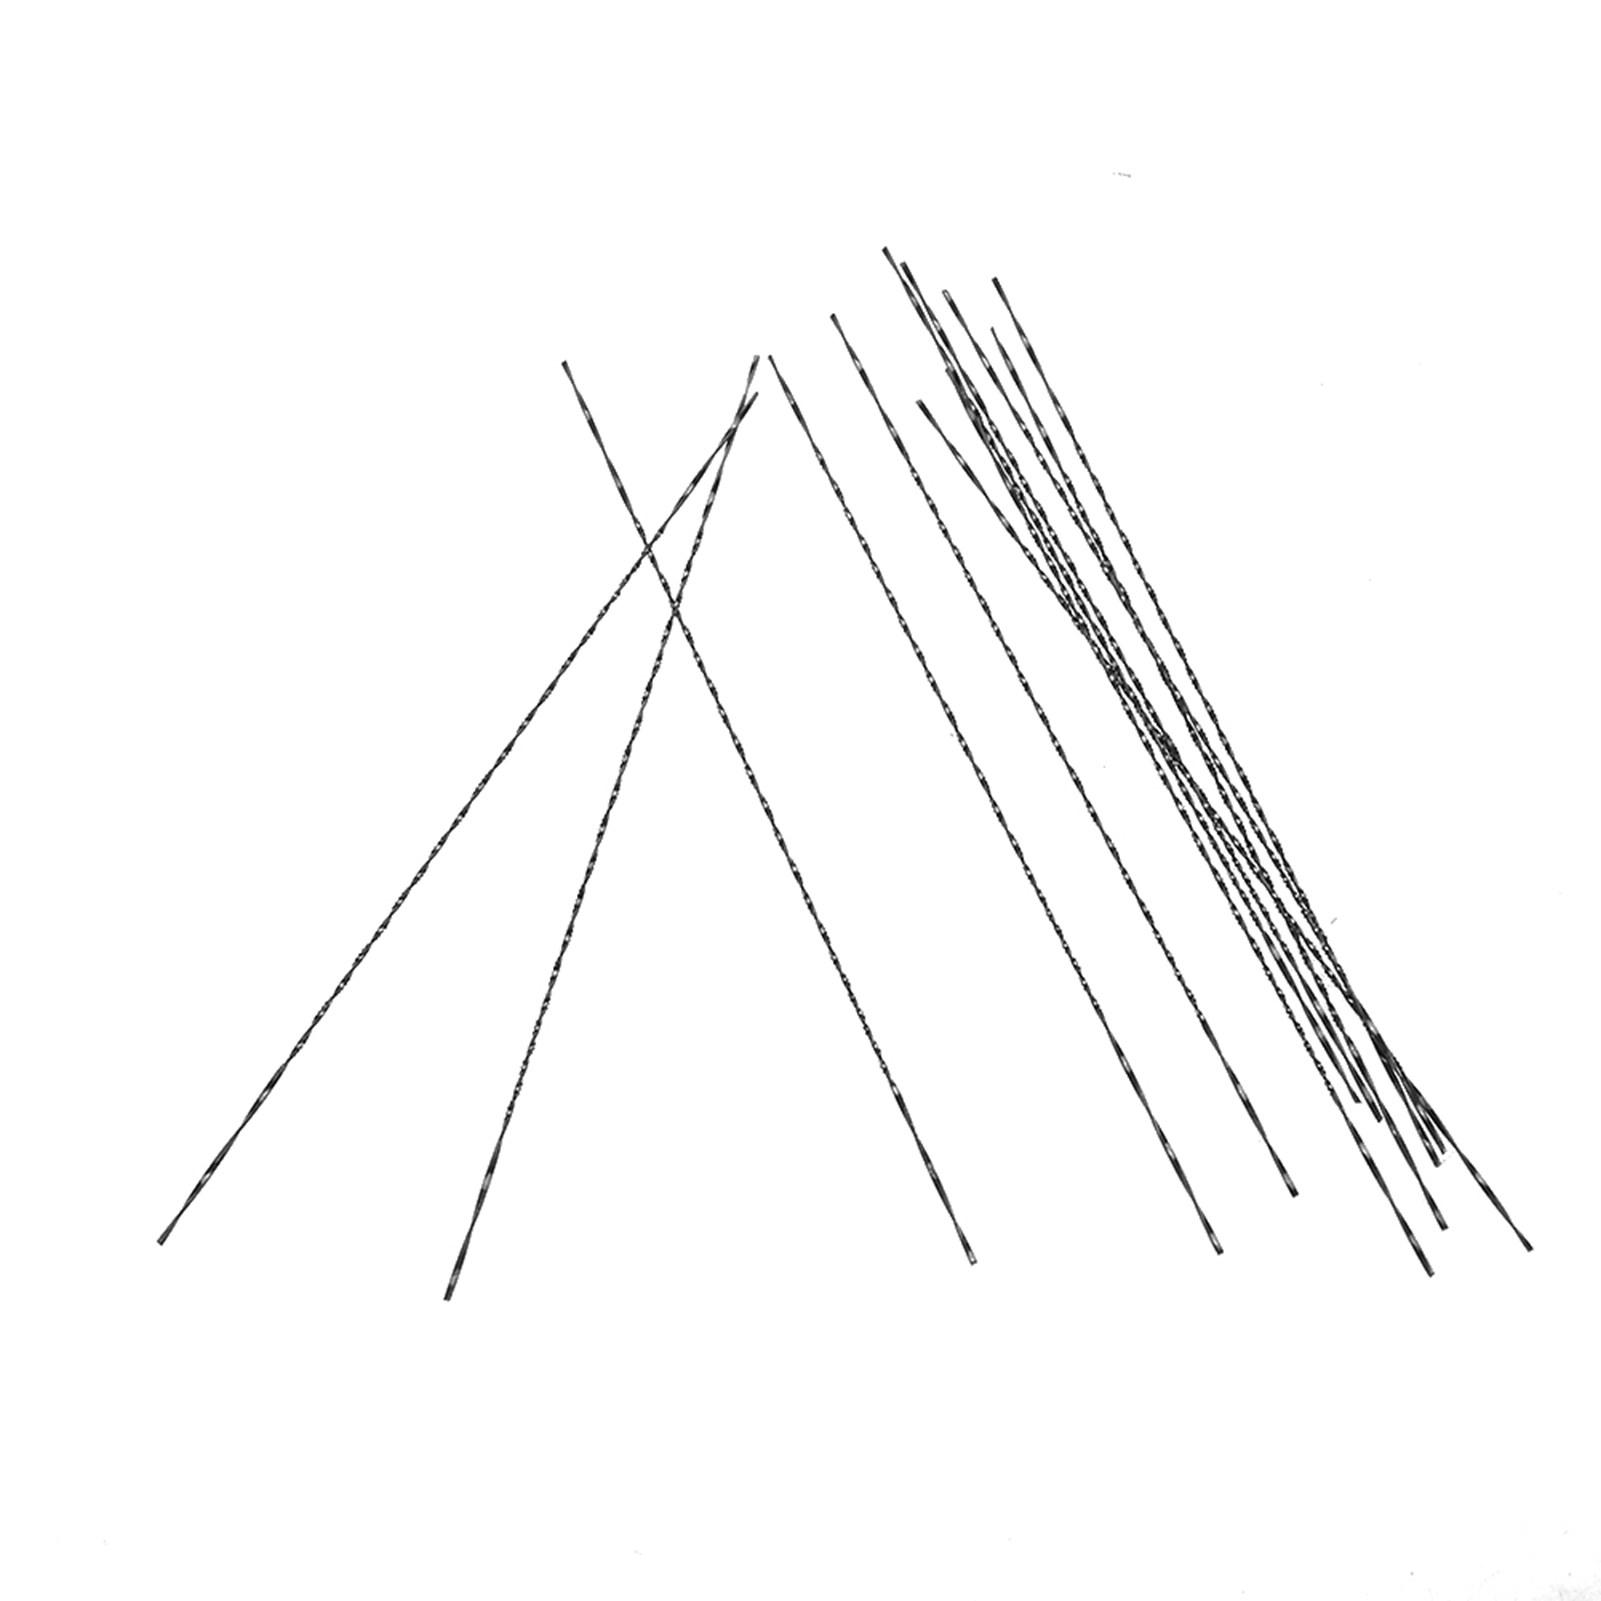 Indexbild 33 - 12pcs Carbon Steel Scroll Saw Blades With Spiral Teeth Wood Cutting Tools AU